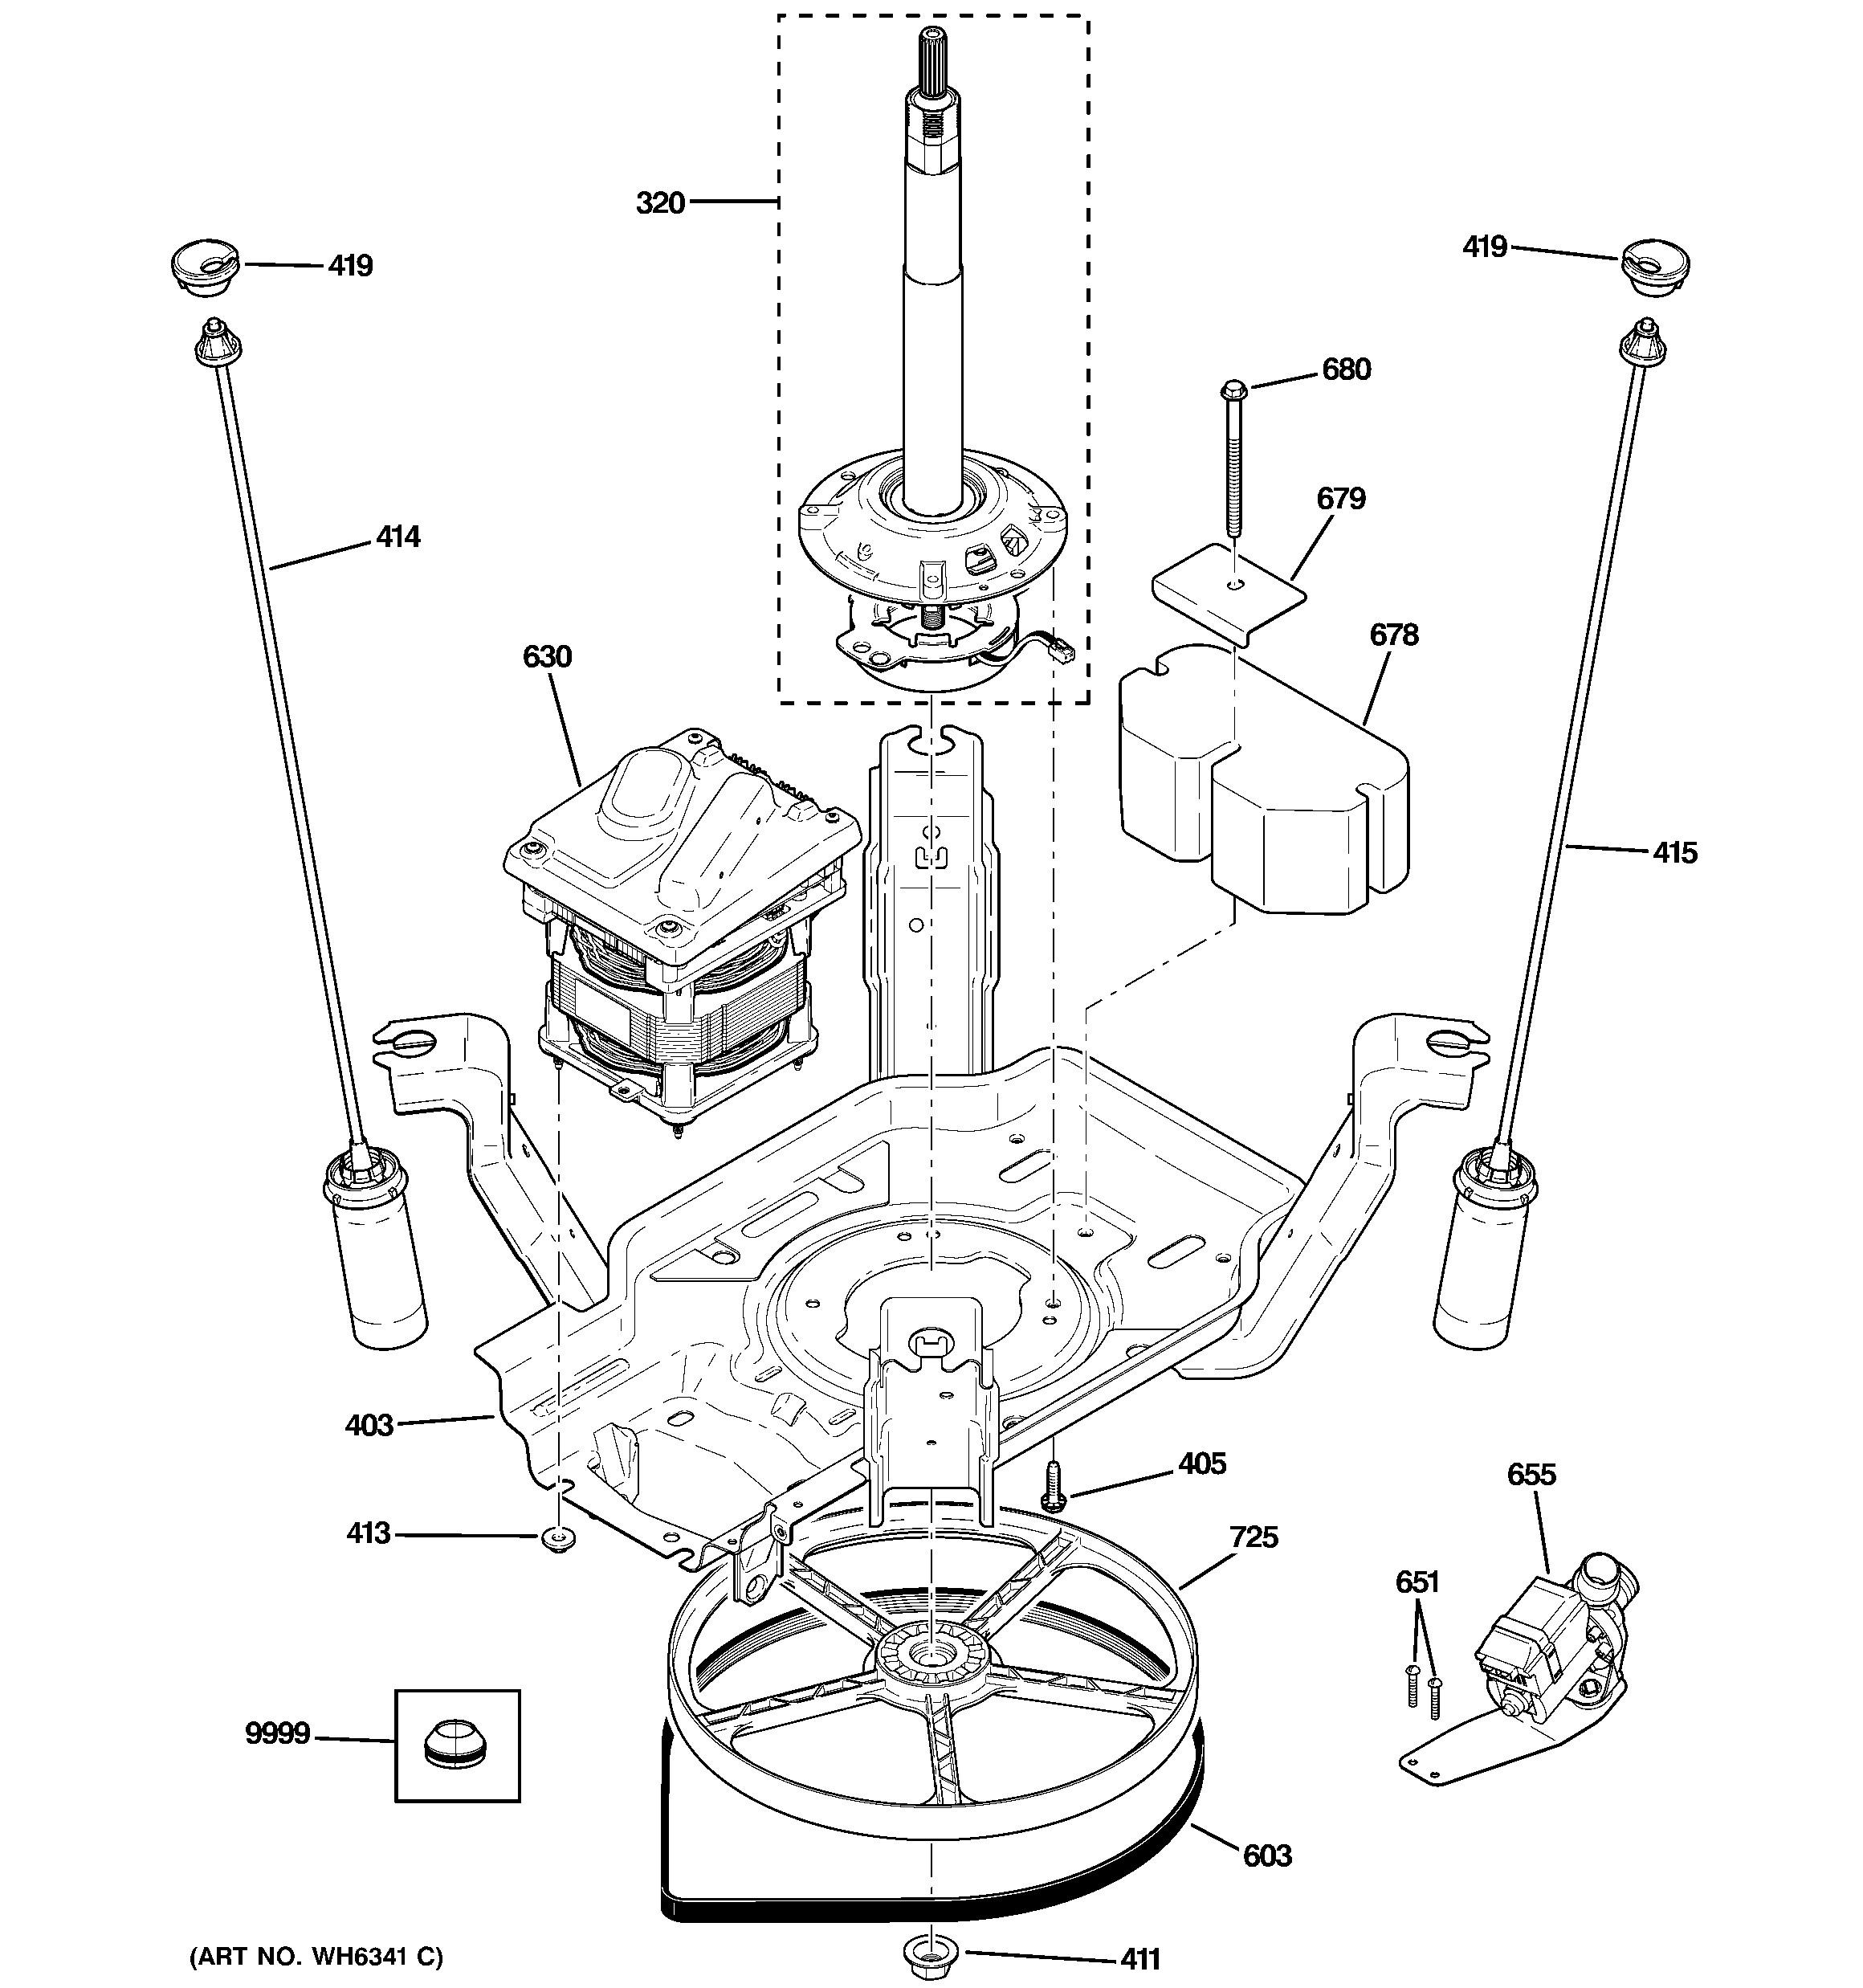 Honda Pressure Washer Parts Diagram Ge Washer Parts Model Whdsr316g0ww Of Honda Pressure Washer Parts Diagram